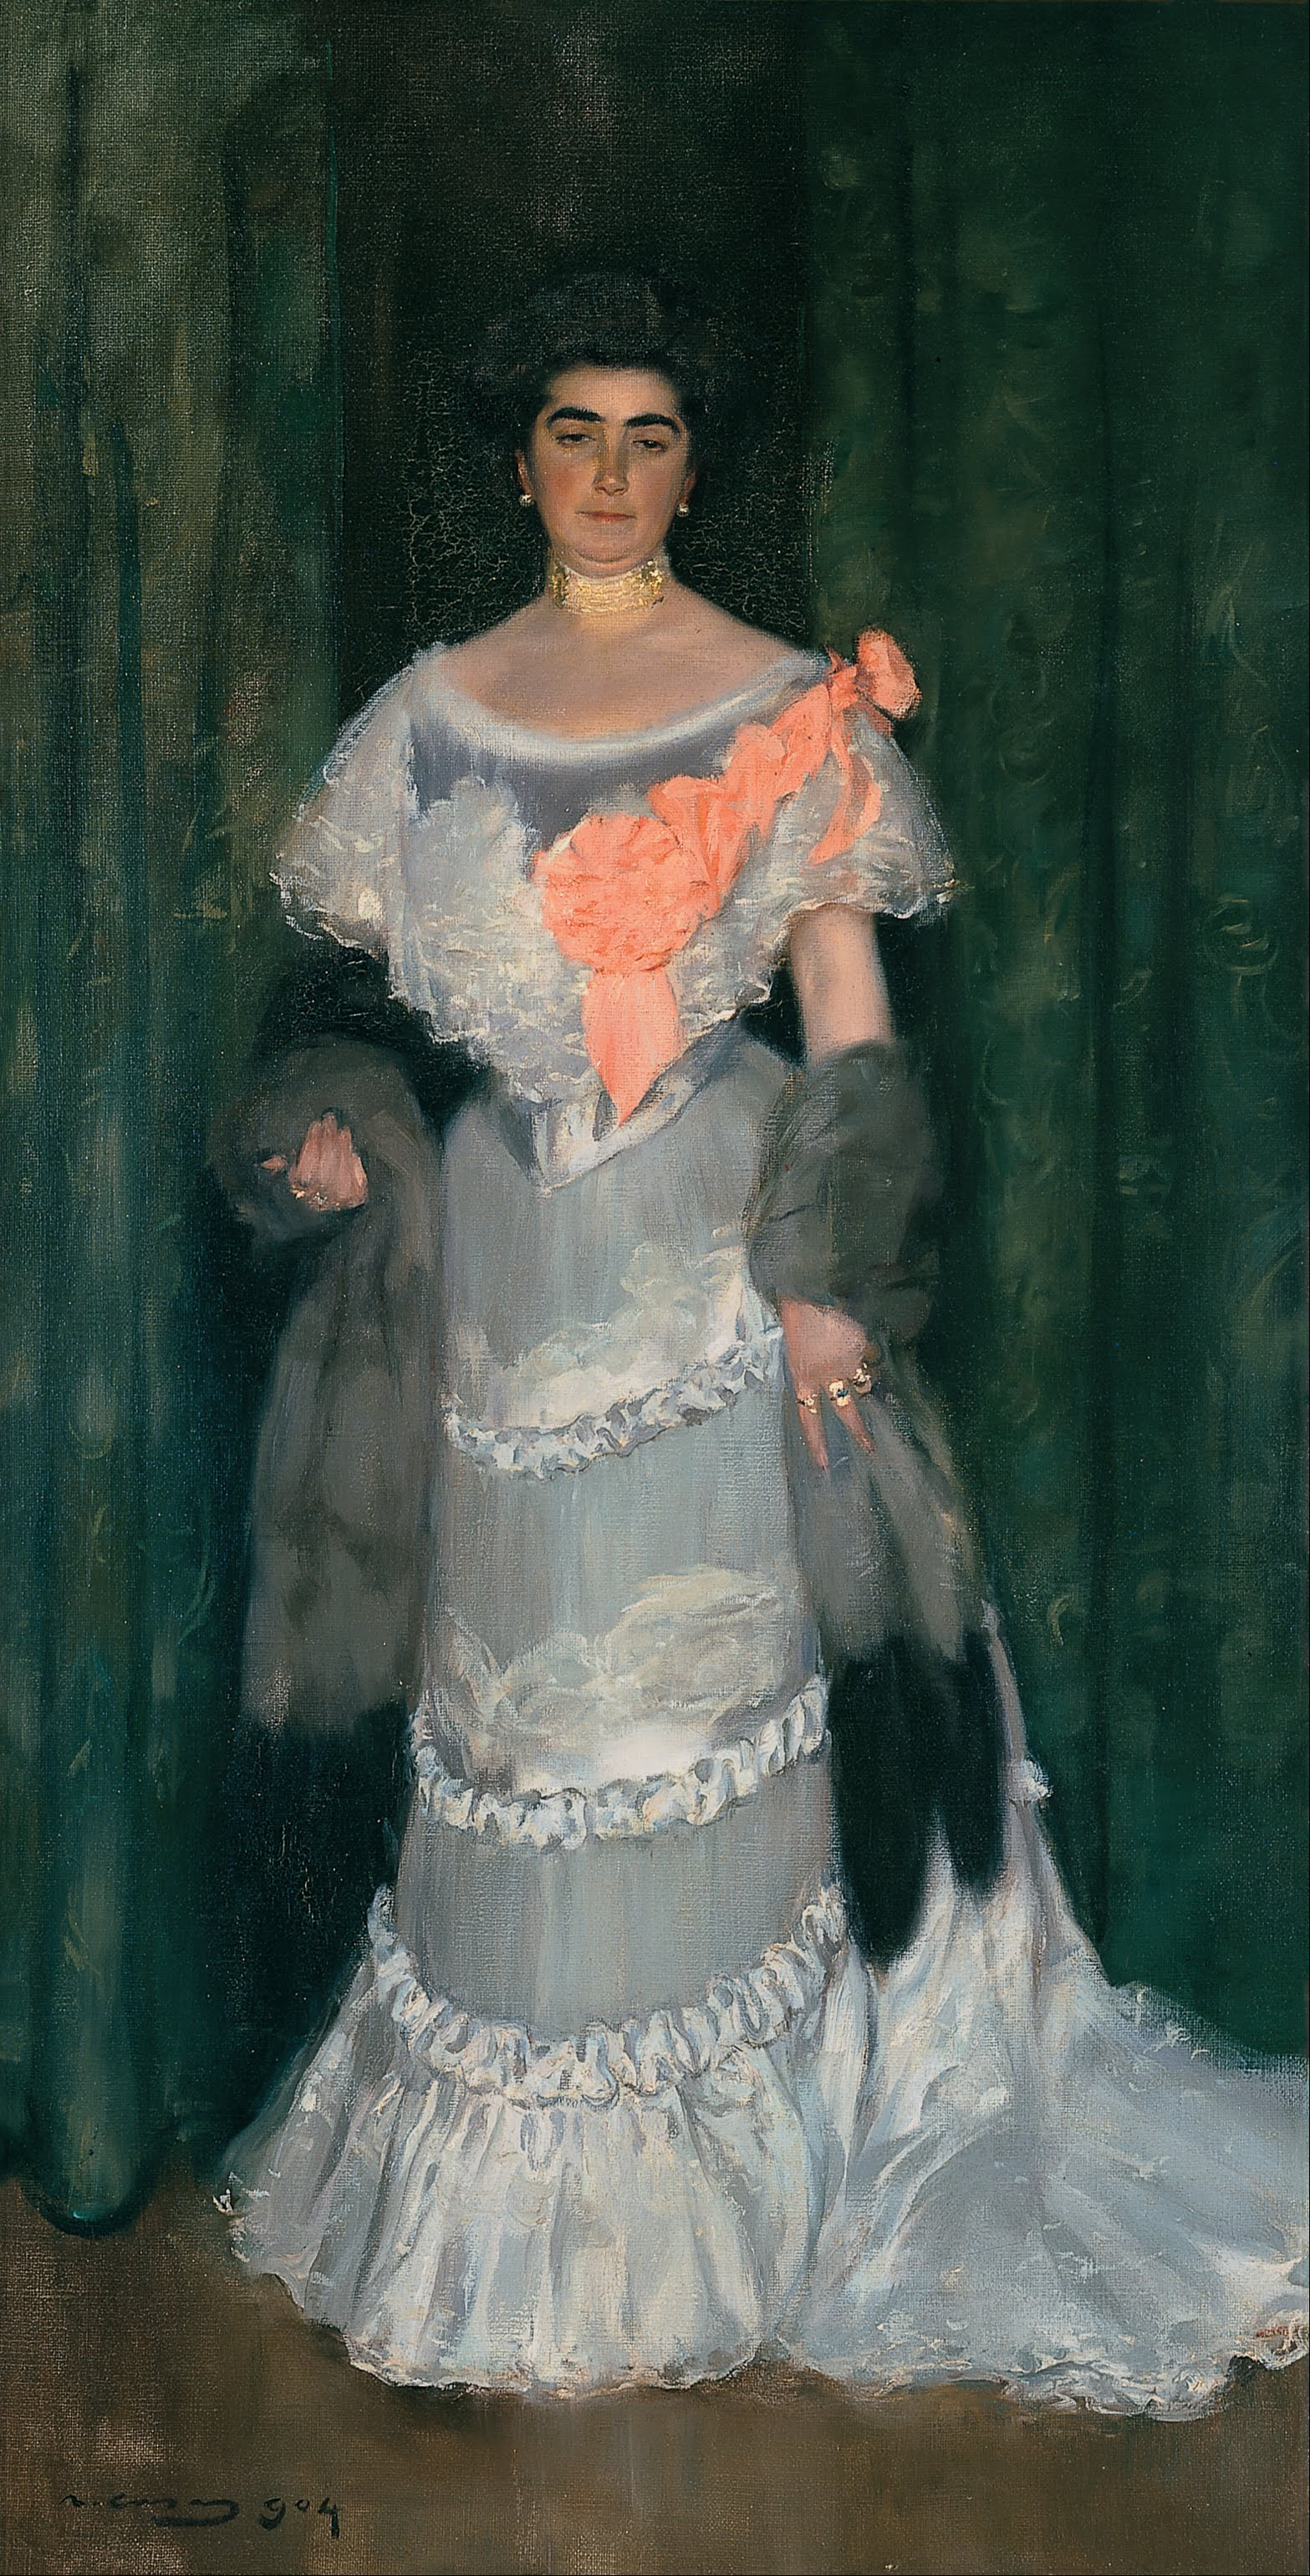 Ramon Casas i Carbó. Portrait of Montserrat Casas de Nieto in an Evening Dress